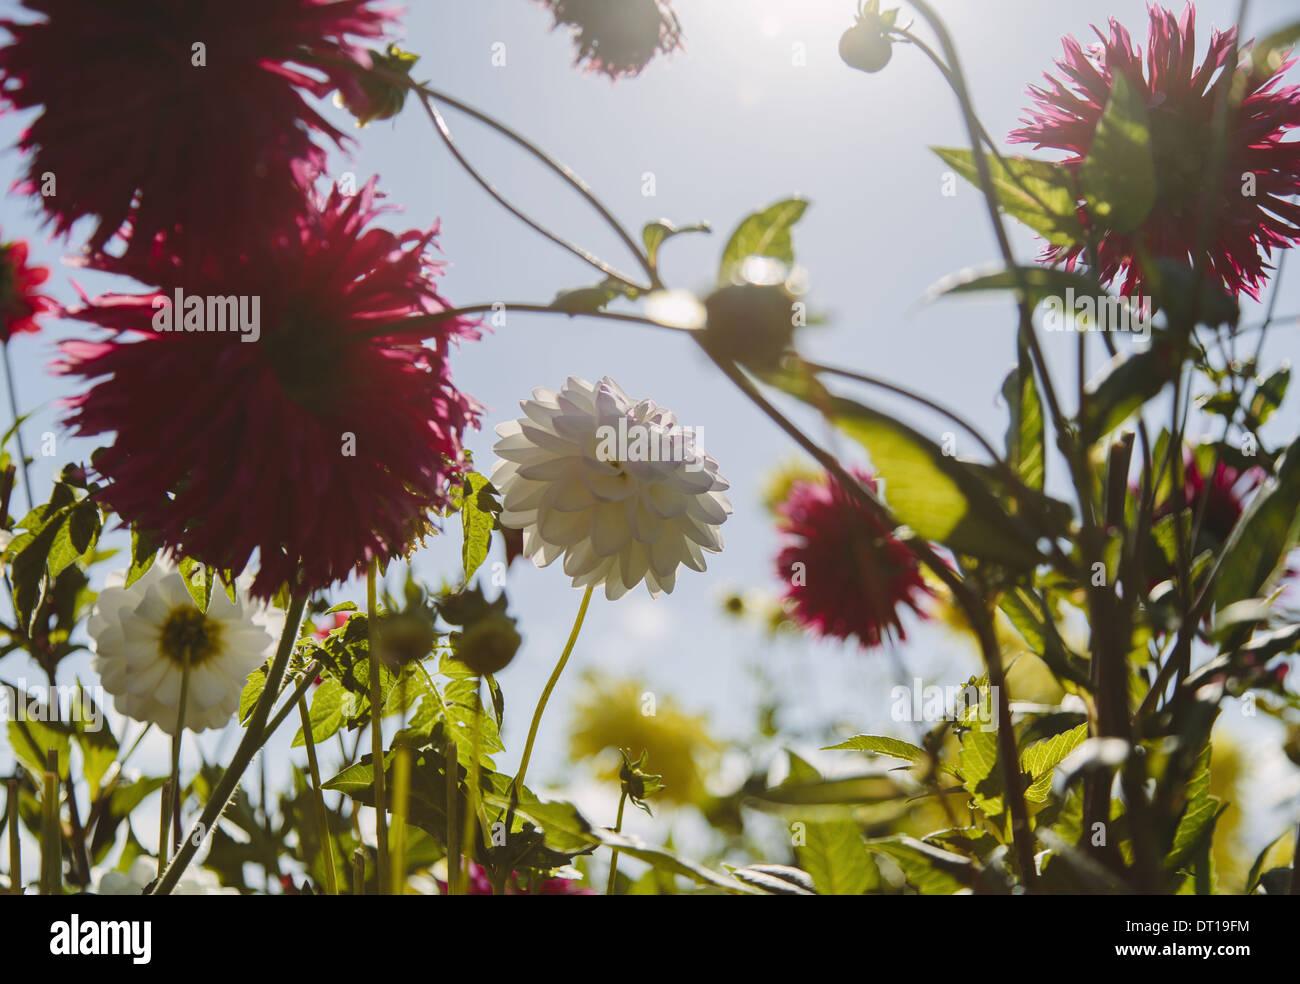 Seattle Washington USA rouge et blanc en fleurs jardin dans dahliflowers Photo Stock